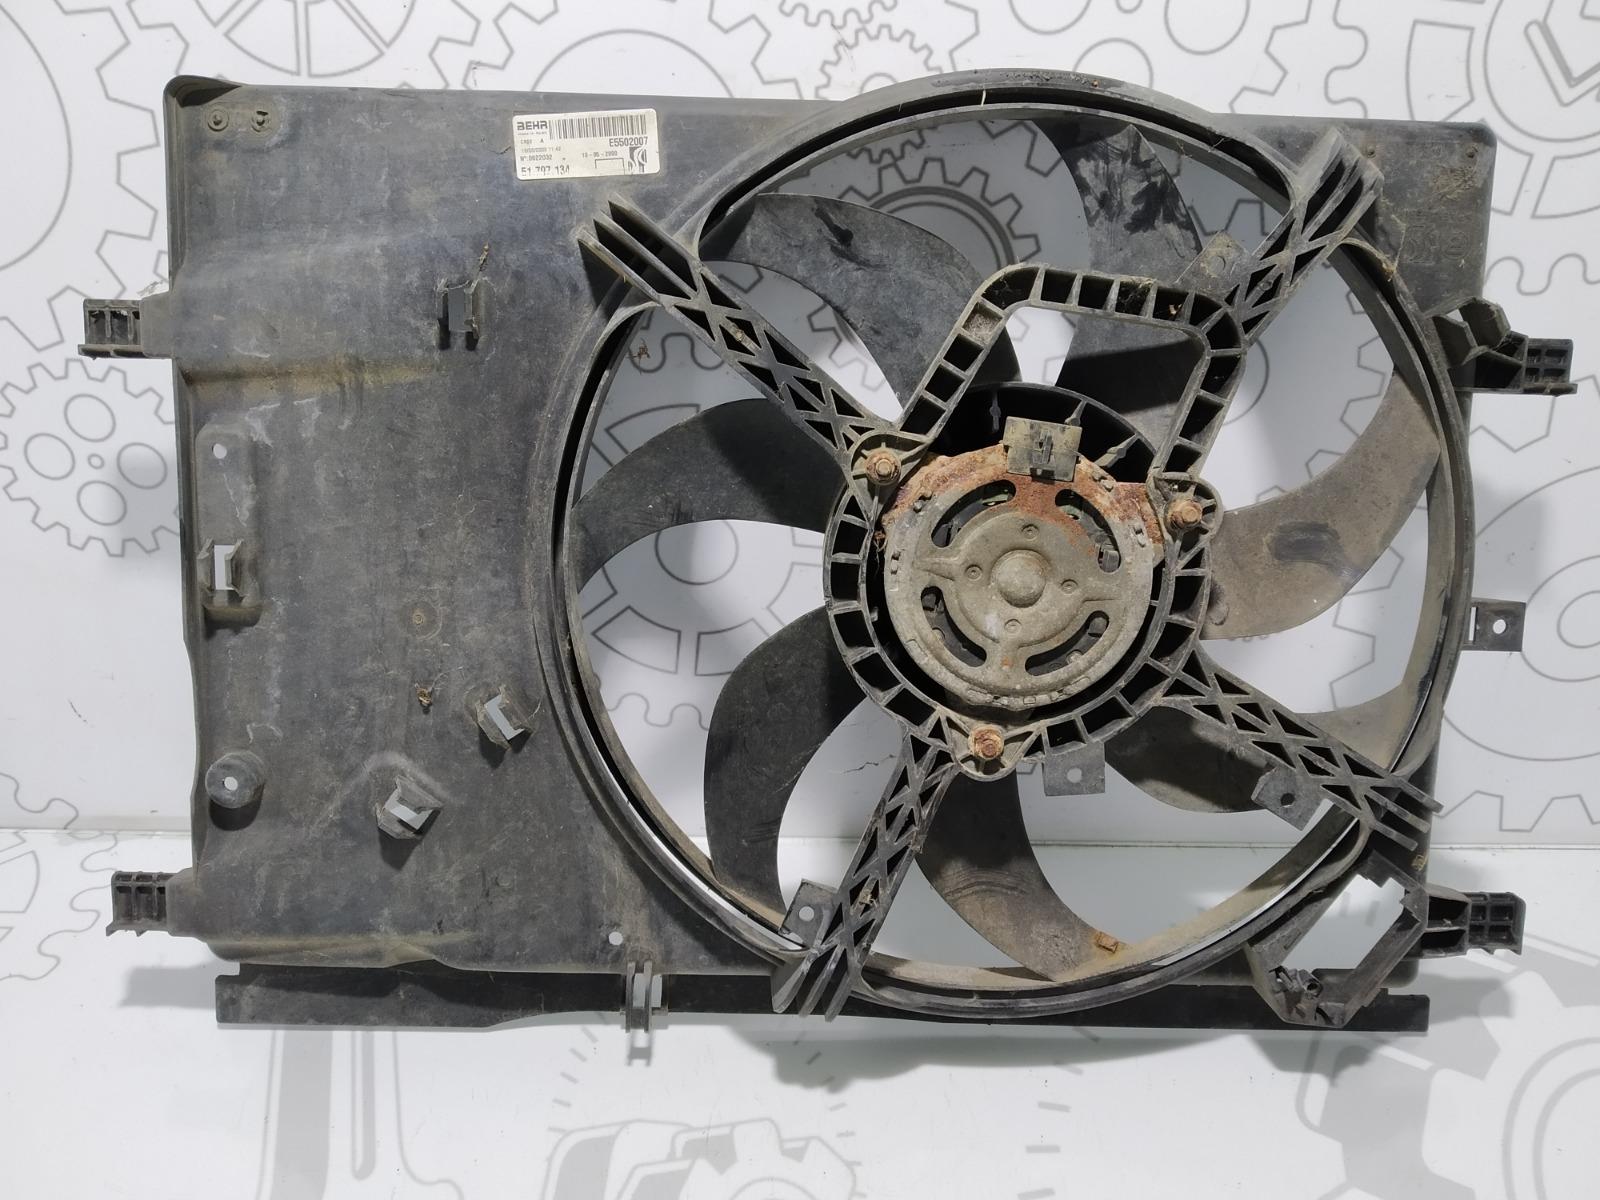 Вентилятор радиатора Fiat Grande Punto 1.4 I 2009 (б/у)